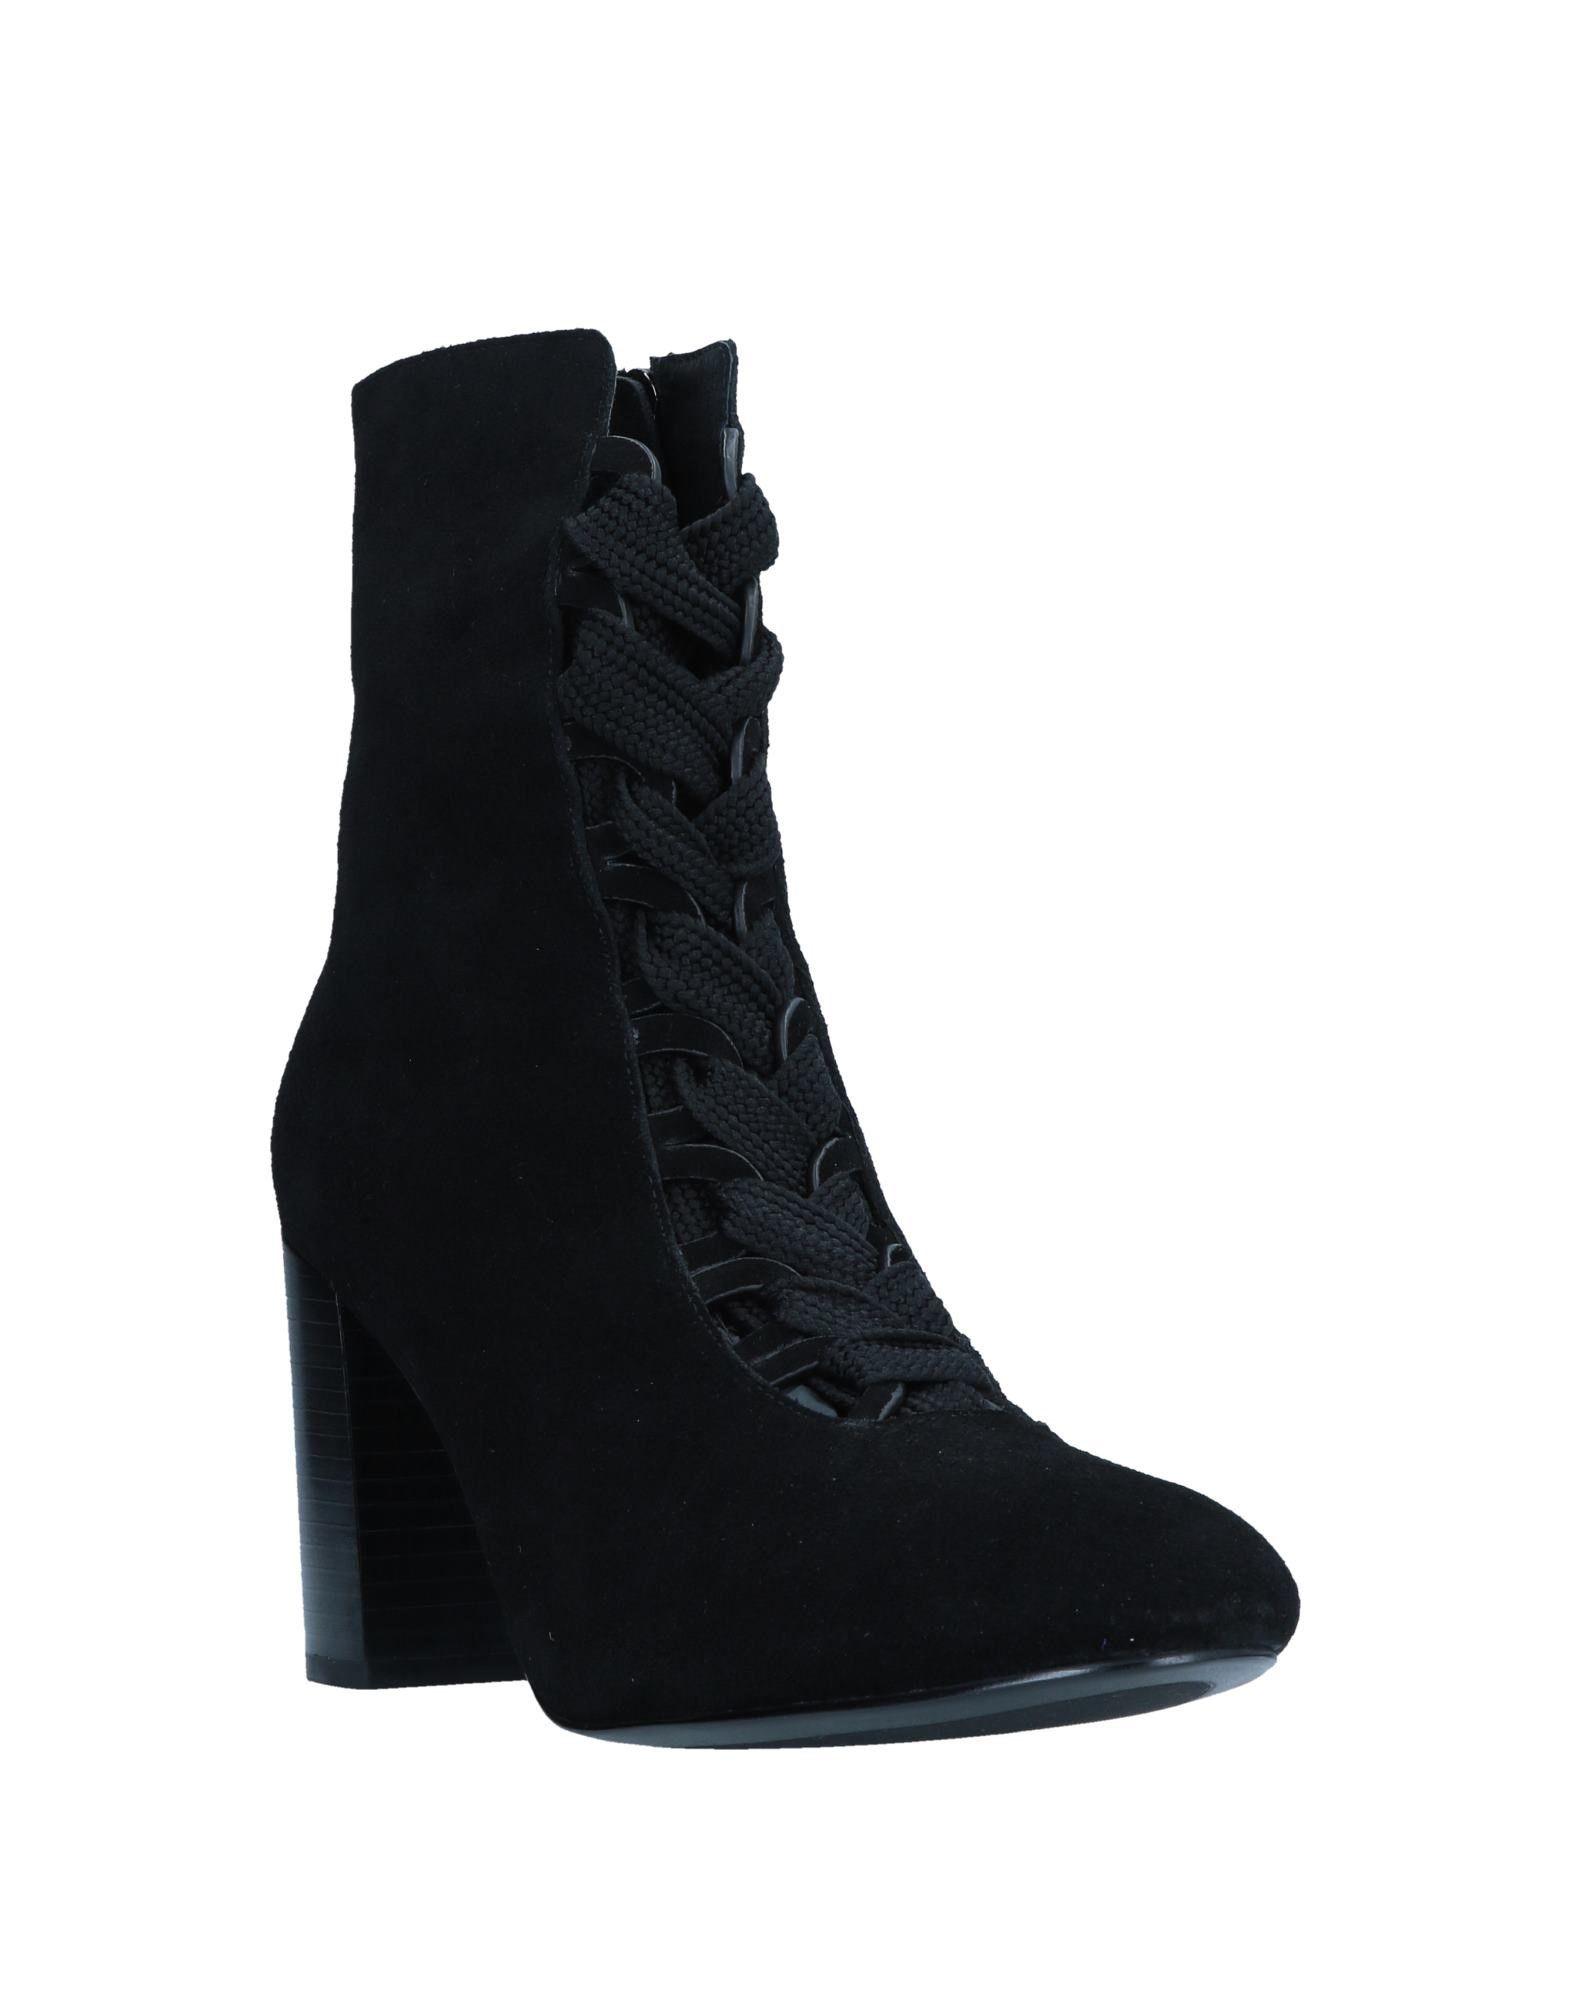 Bibi Lou Stiefelette Damen  11525428TF Gute Qualität beliebte Schuhe